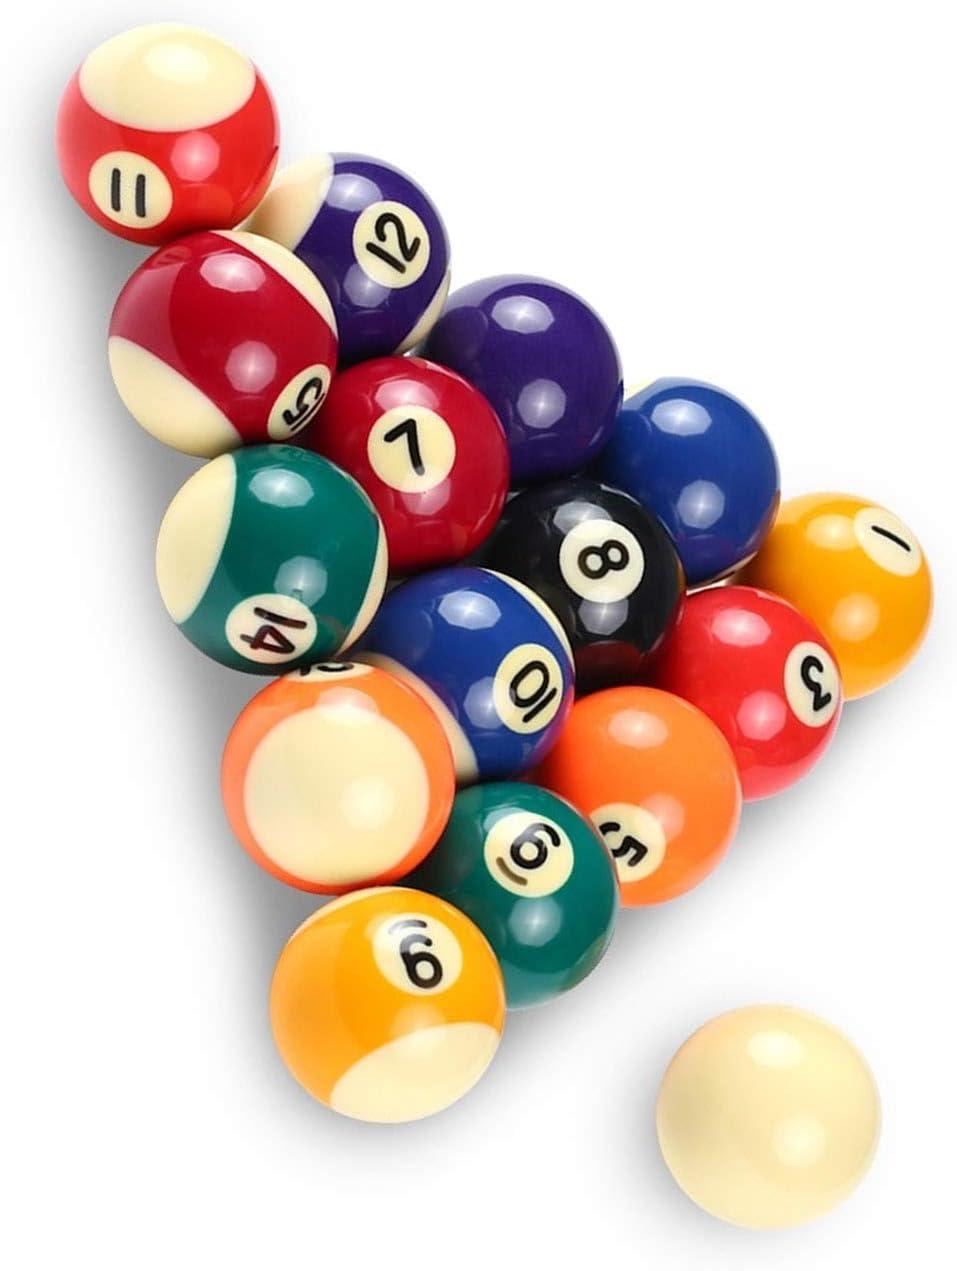 IINSSDJ Small Pool Cue Sales results No. 1 1 year warranty Balls Table Full Set Billiards